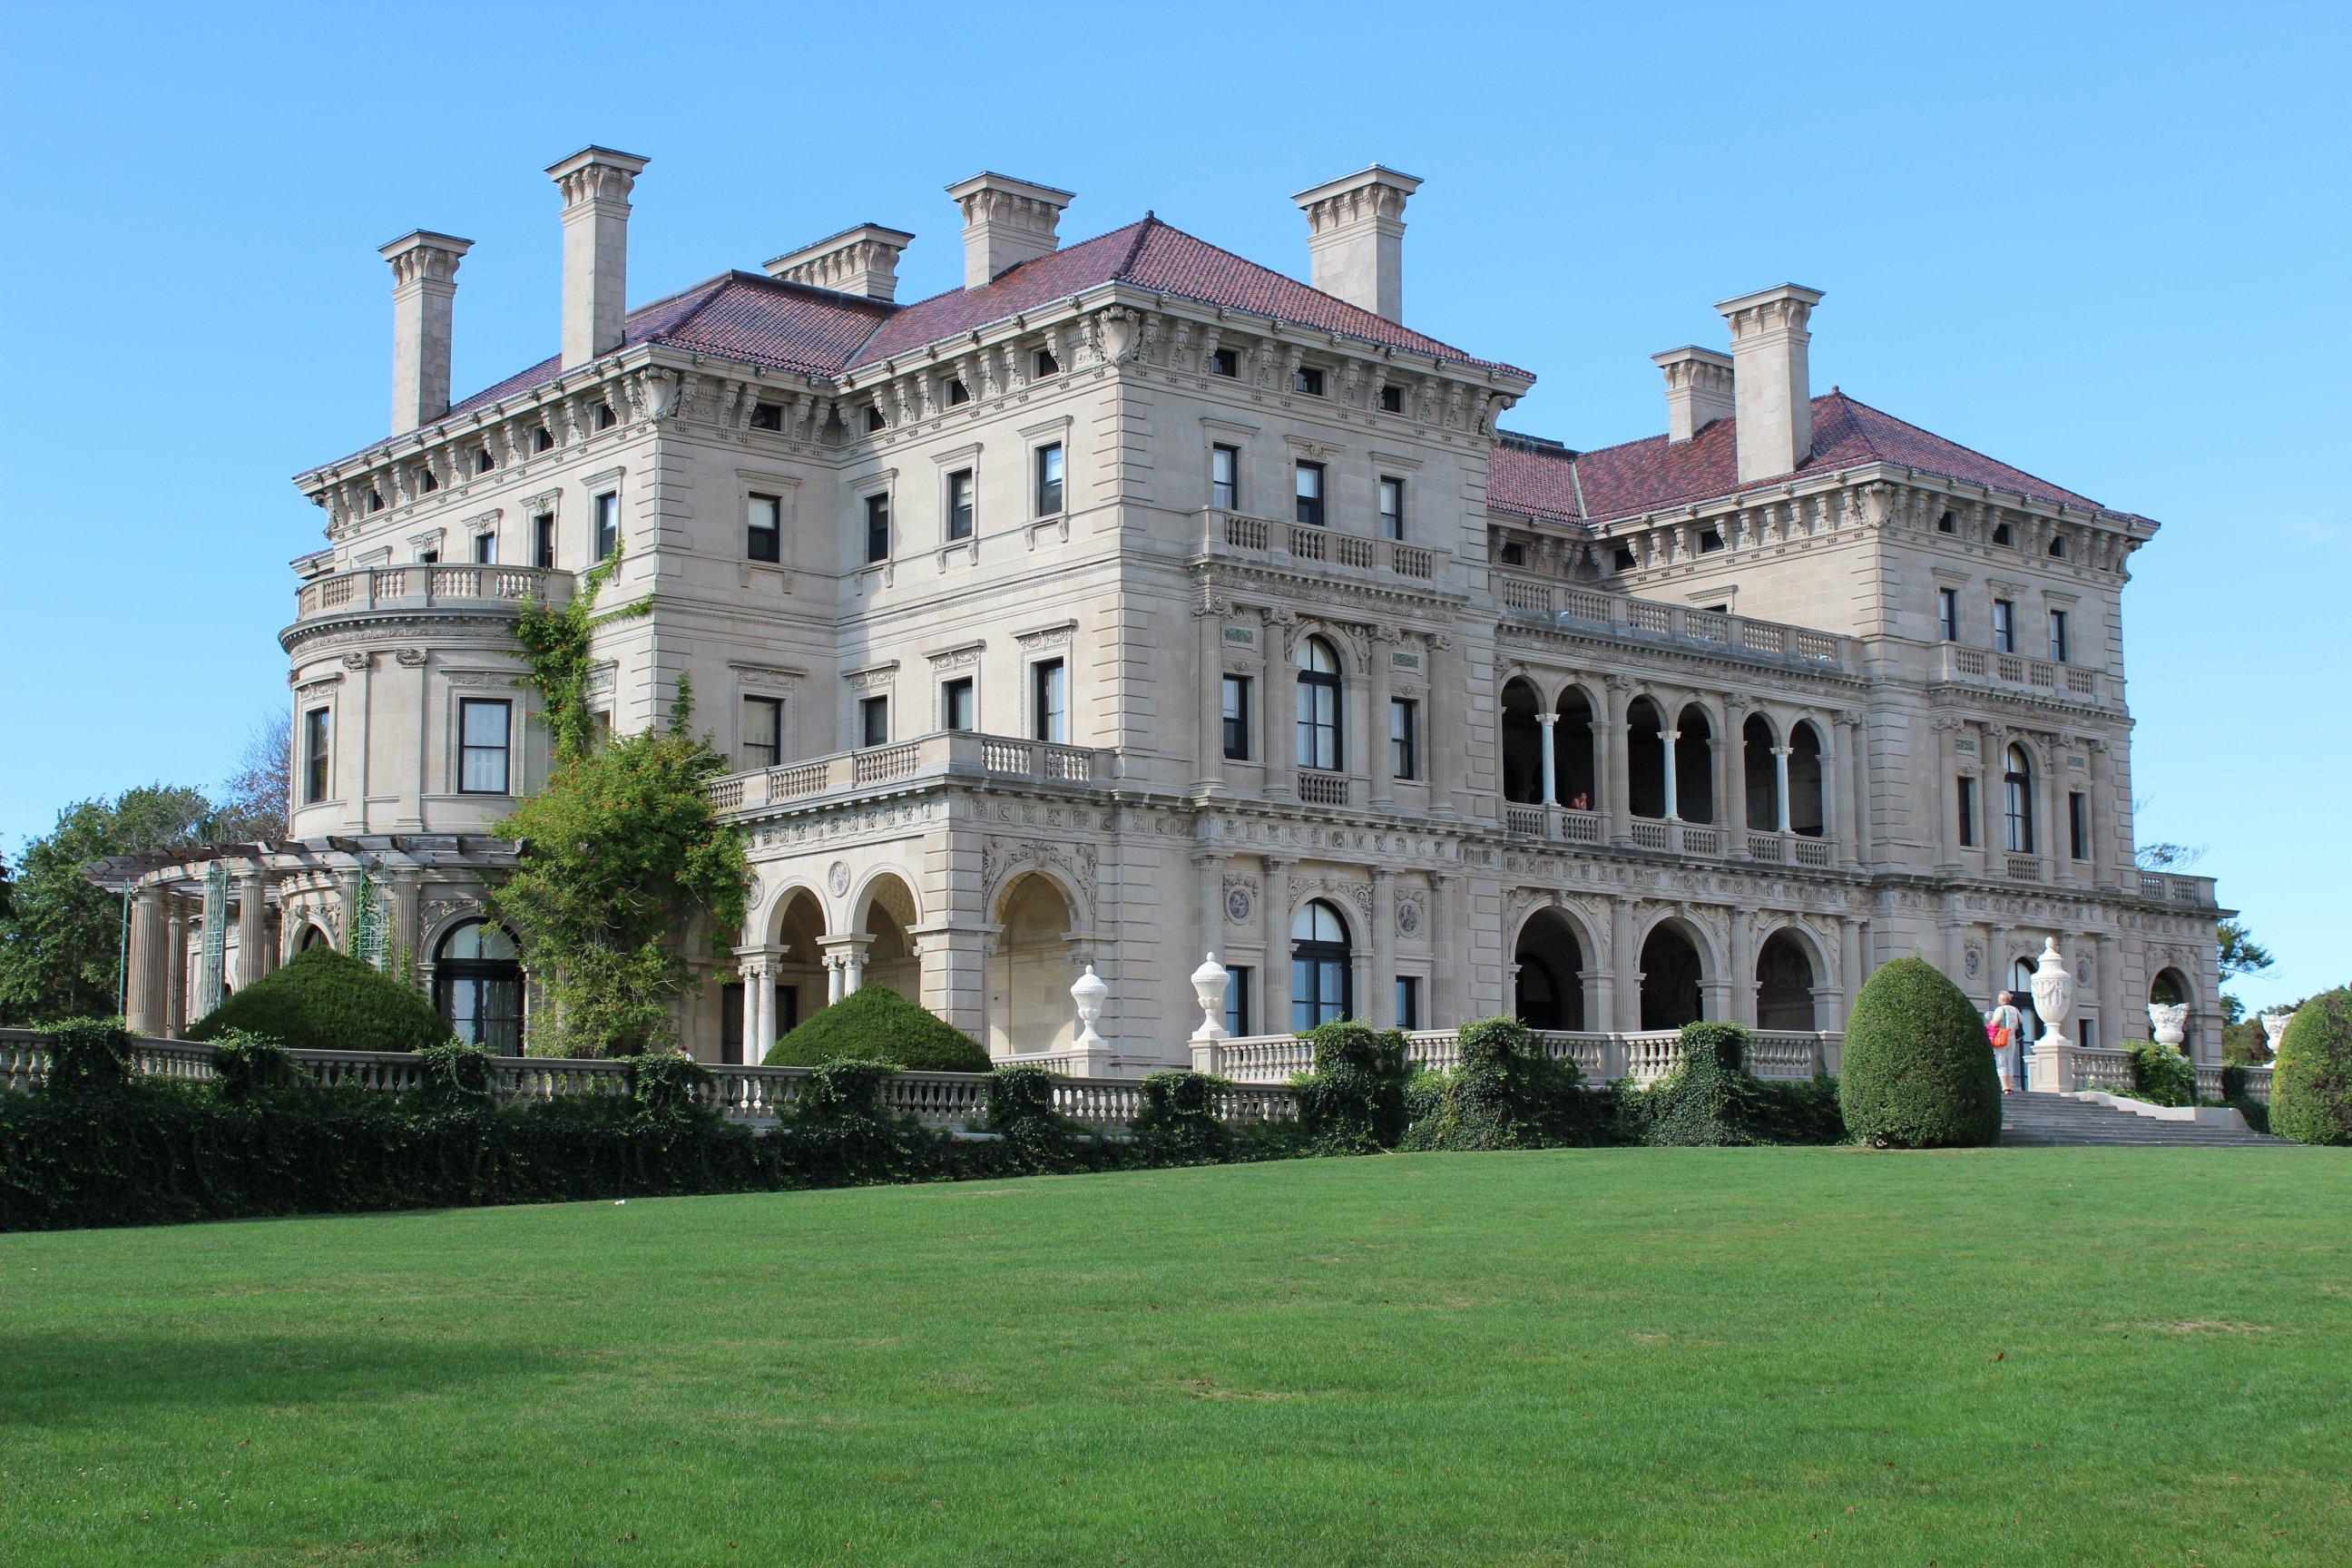 Indiana Limestone The Breakers Vanderbilt Mansion Newport RI 2 Credit Shinya Suzuki-1